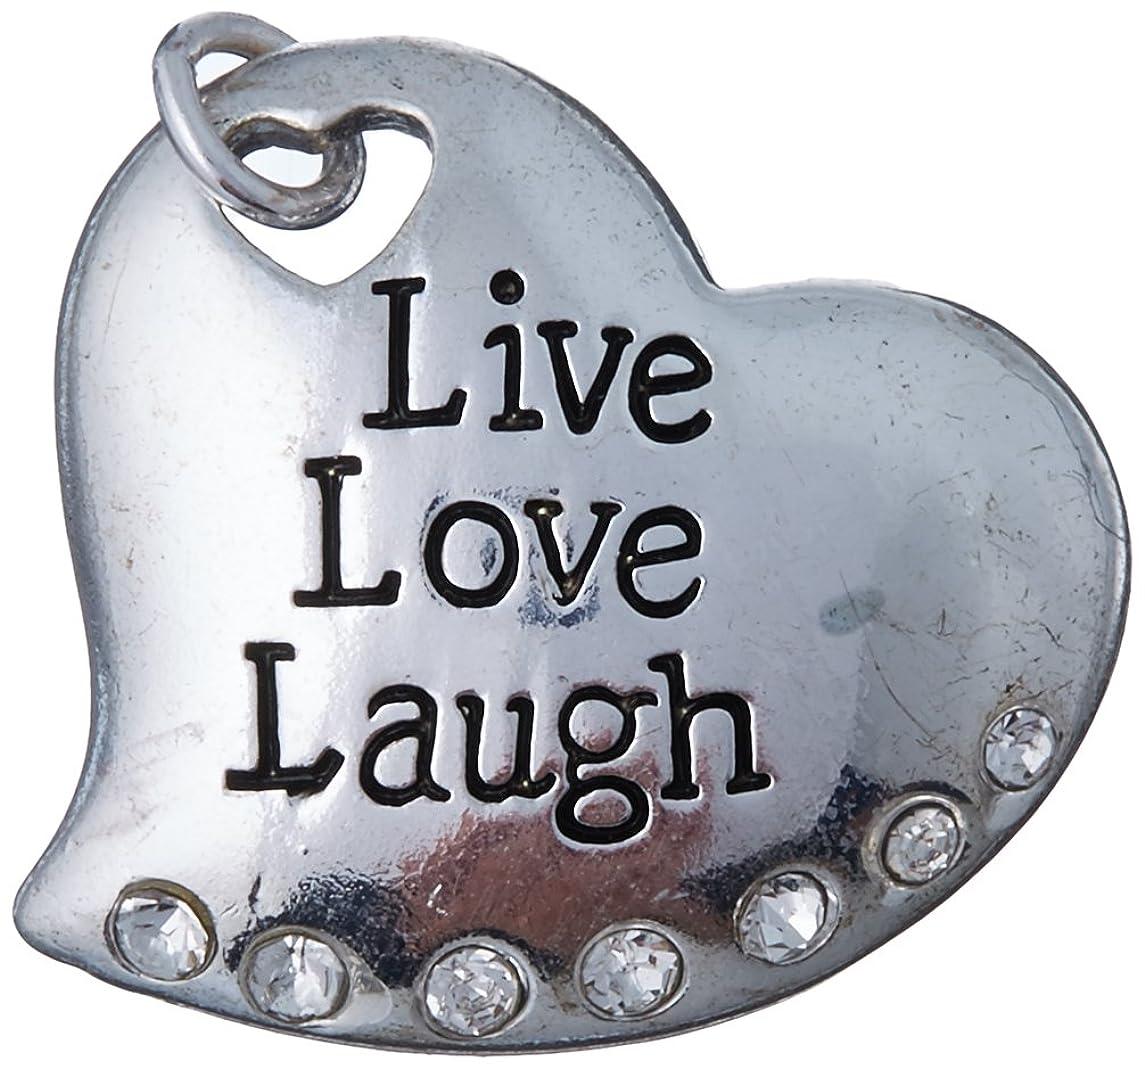 Jewelry Designer SJ14214PT Live Heart Charm Ant.Silver 20X18Mm 1Pc